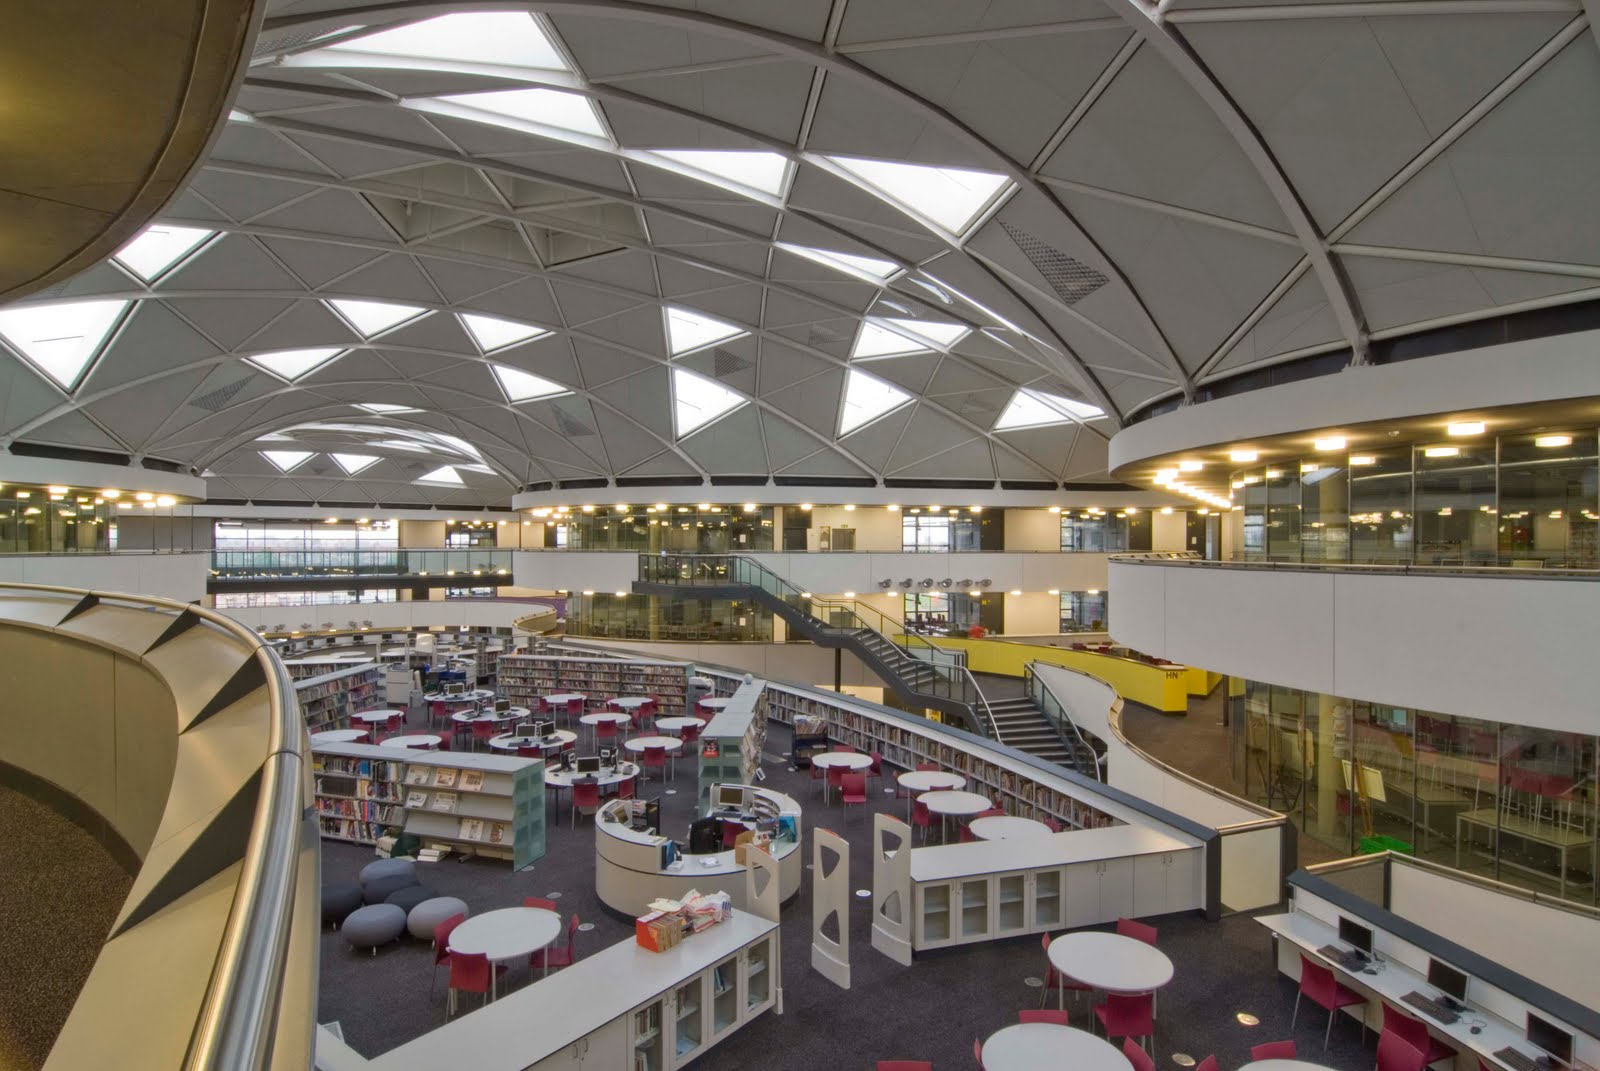 Thomas Deacon Academy, UK | School design | Pinterest